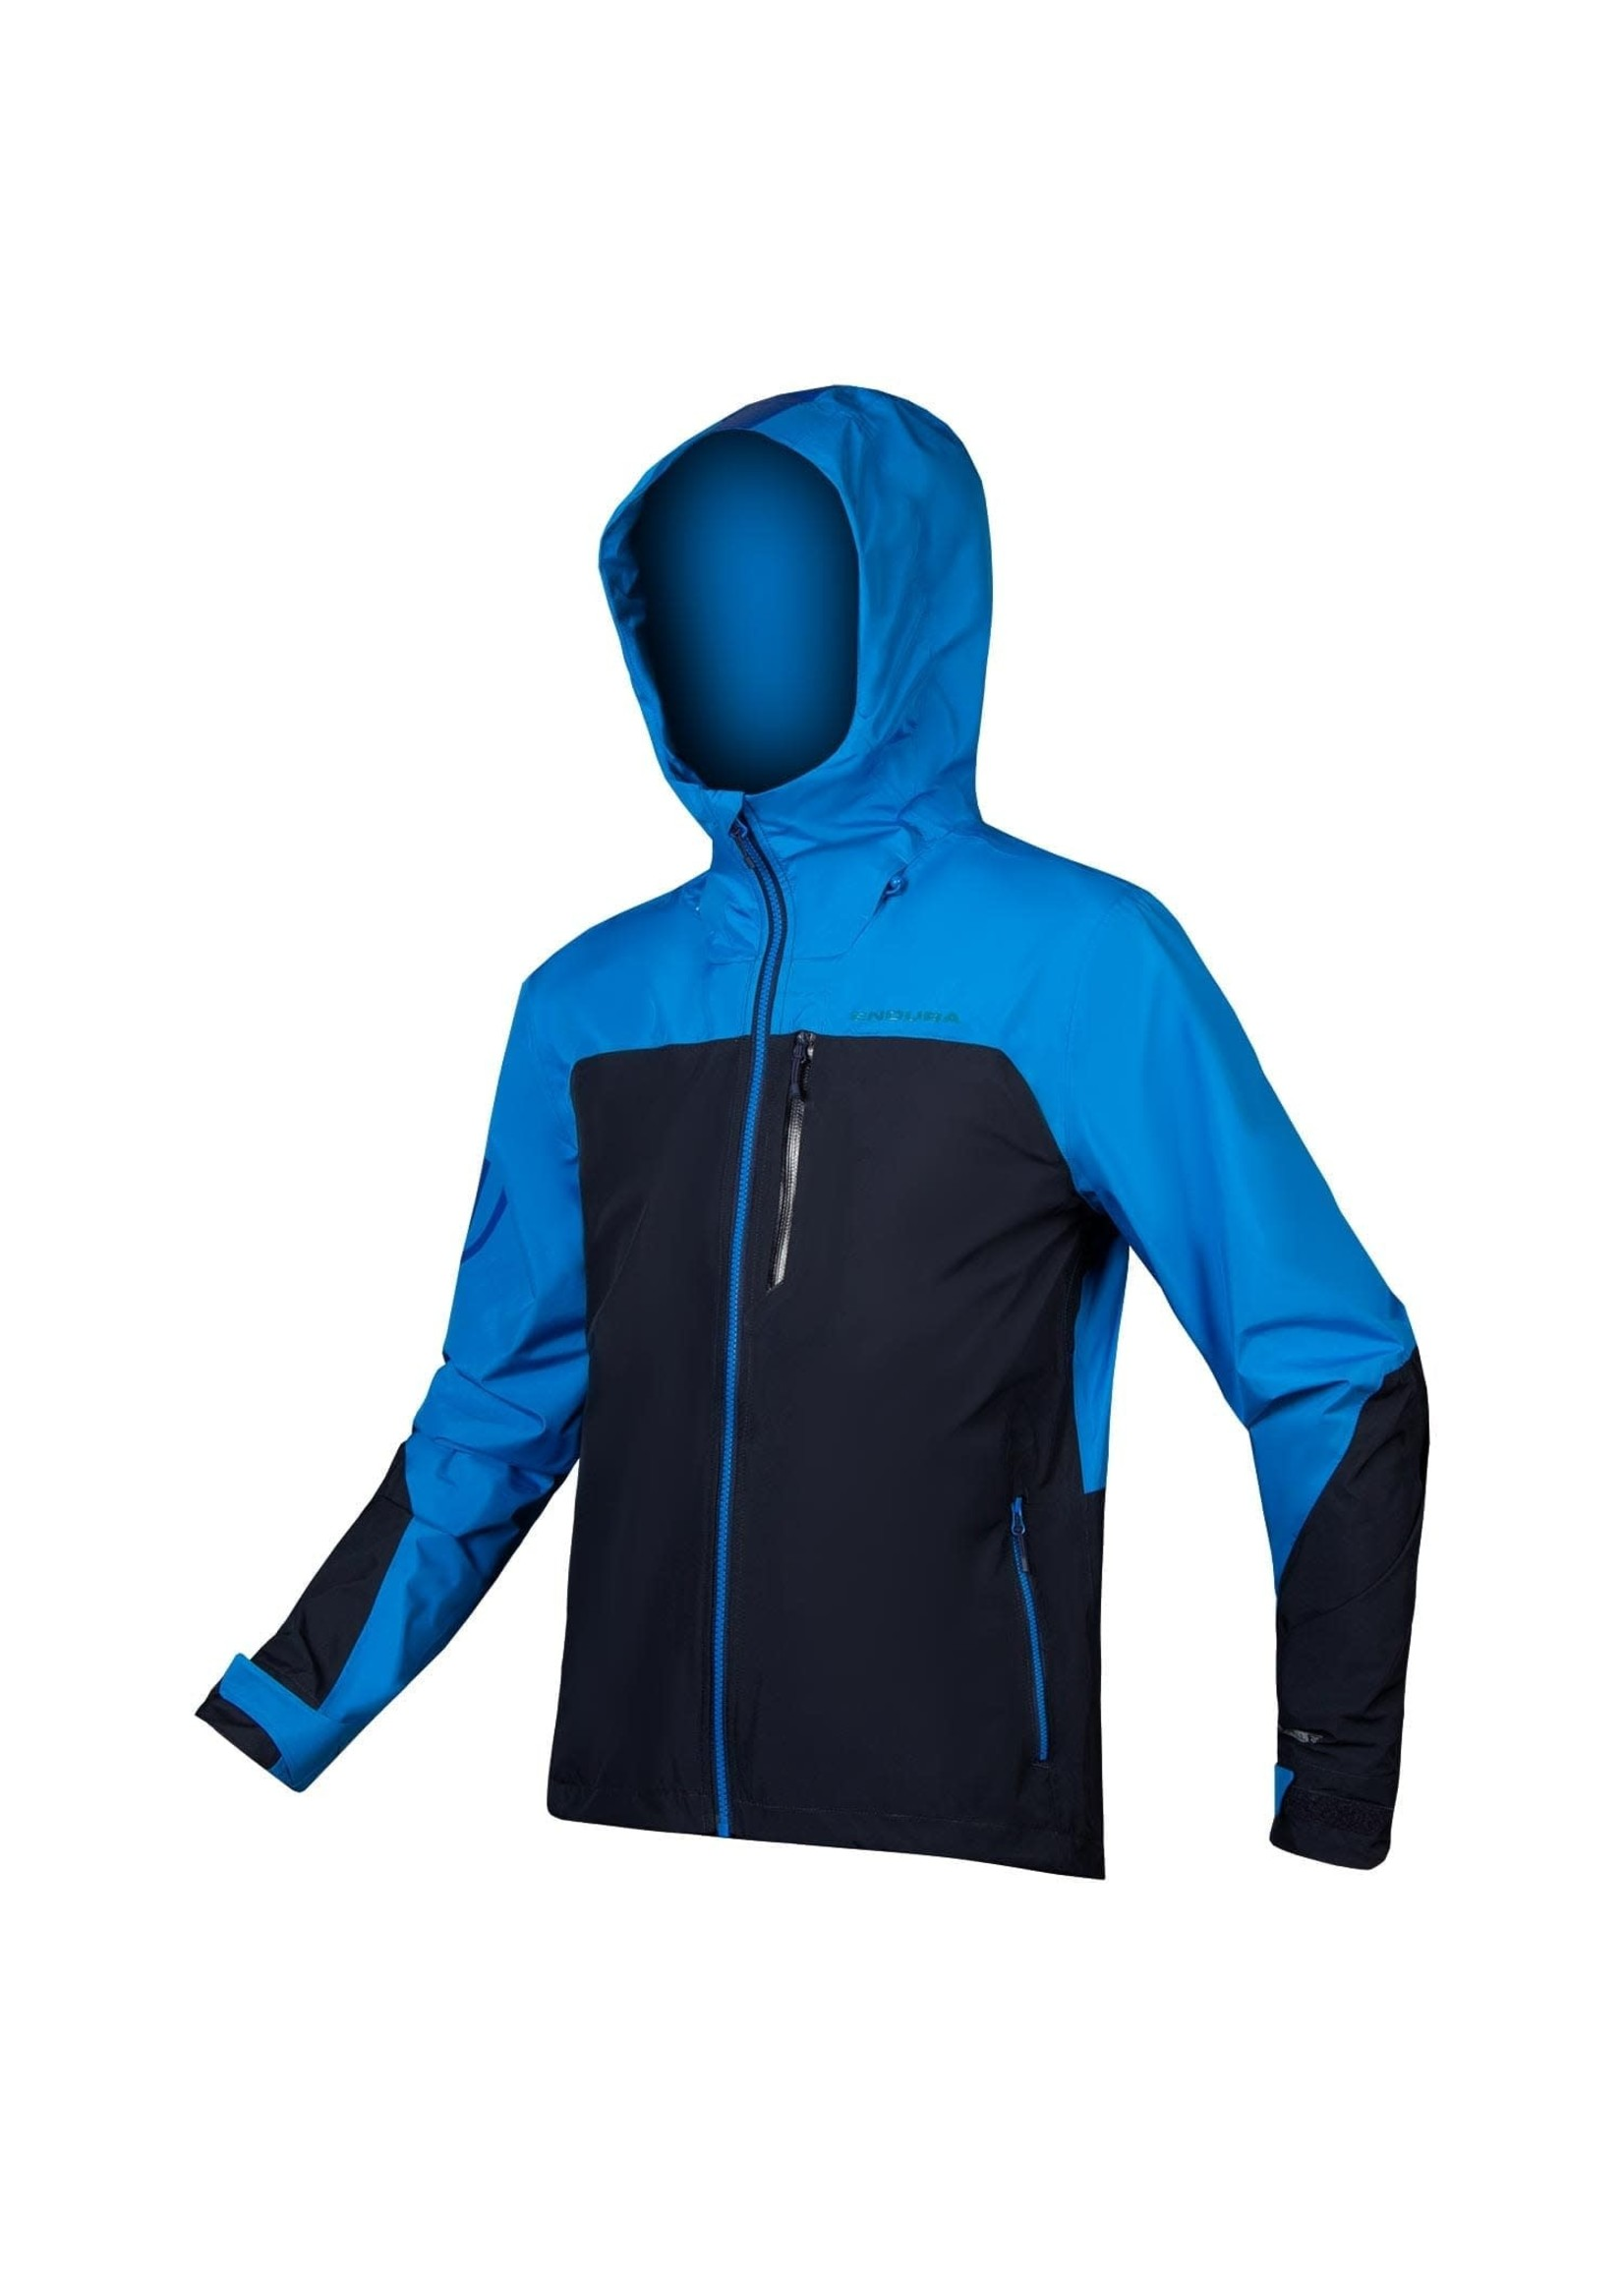 Endura SingleTrack Waterproof Jkt,  Blue: M